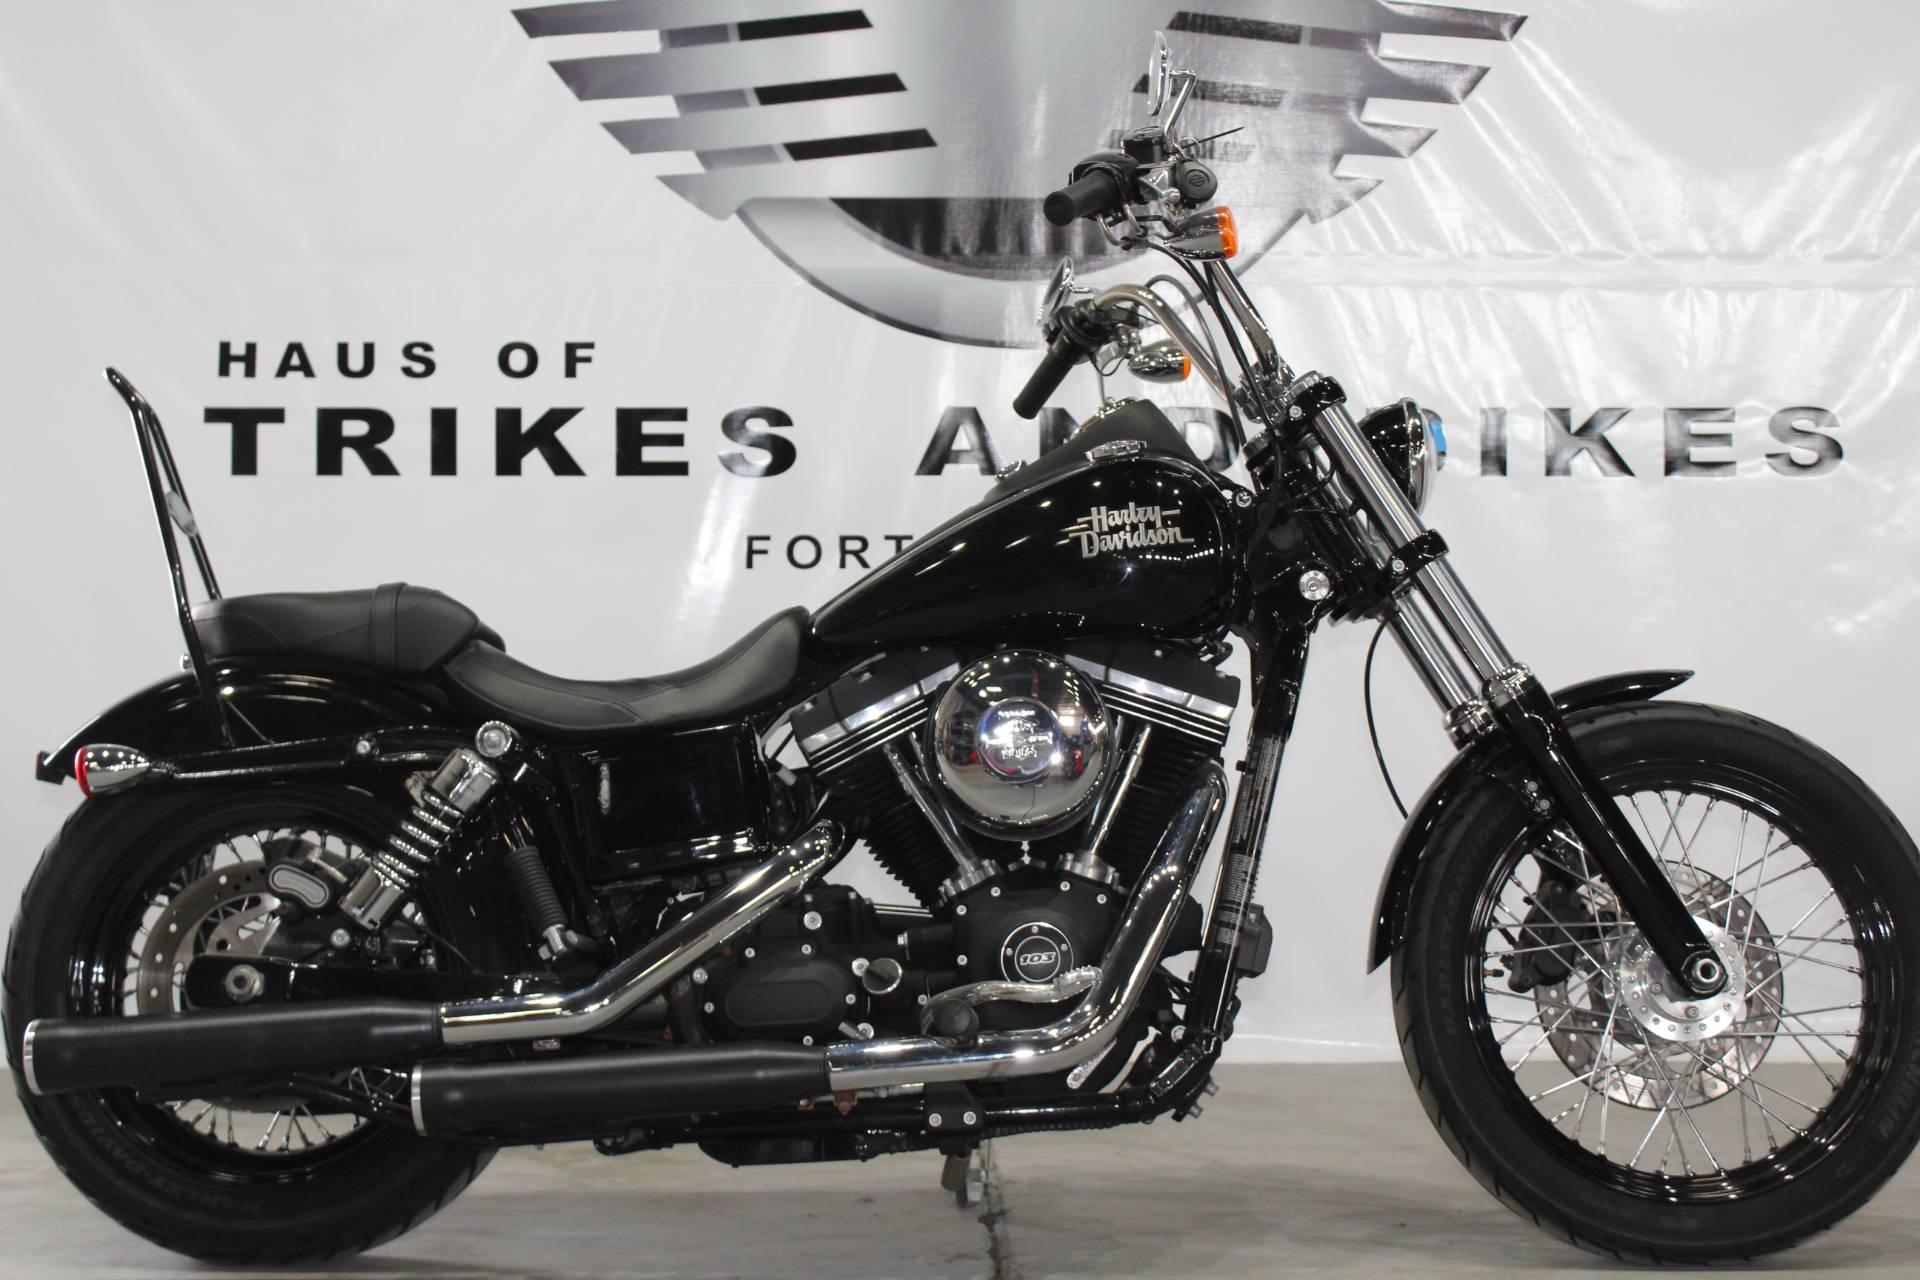 Used 2015 Harley Davidson Street Bob Motorcycles in Fort Myers FL